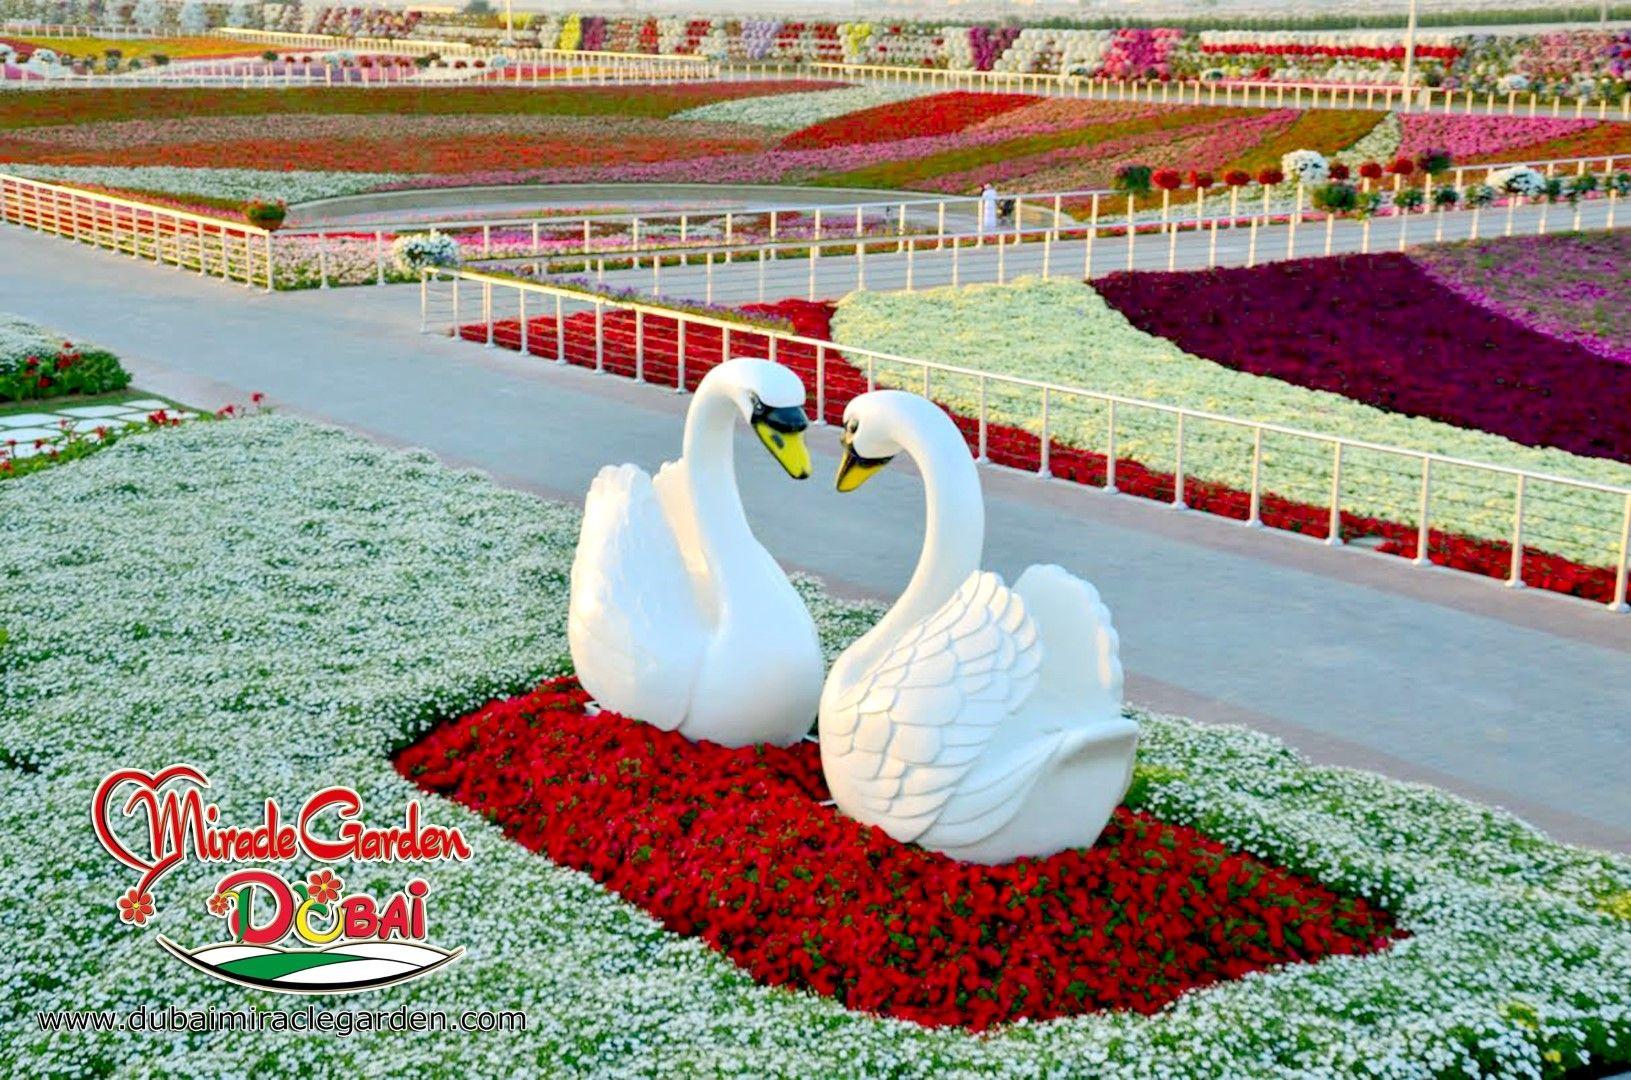 Dubai Miracle Garden The World's Biggest Natural Flower